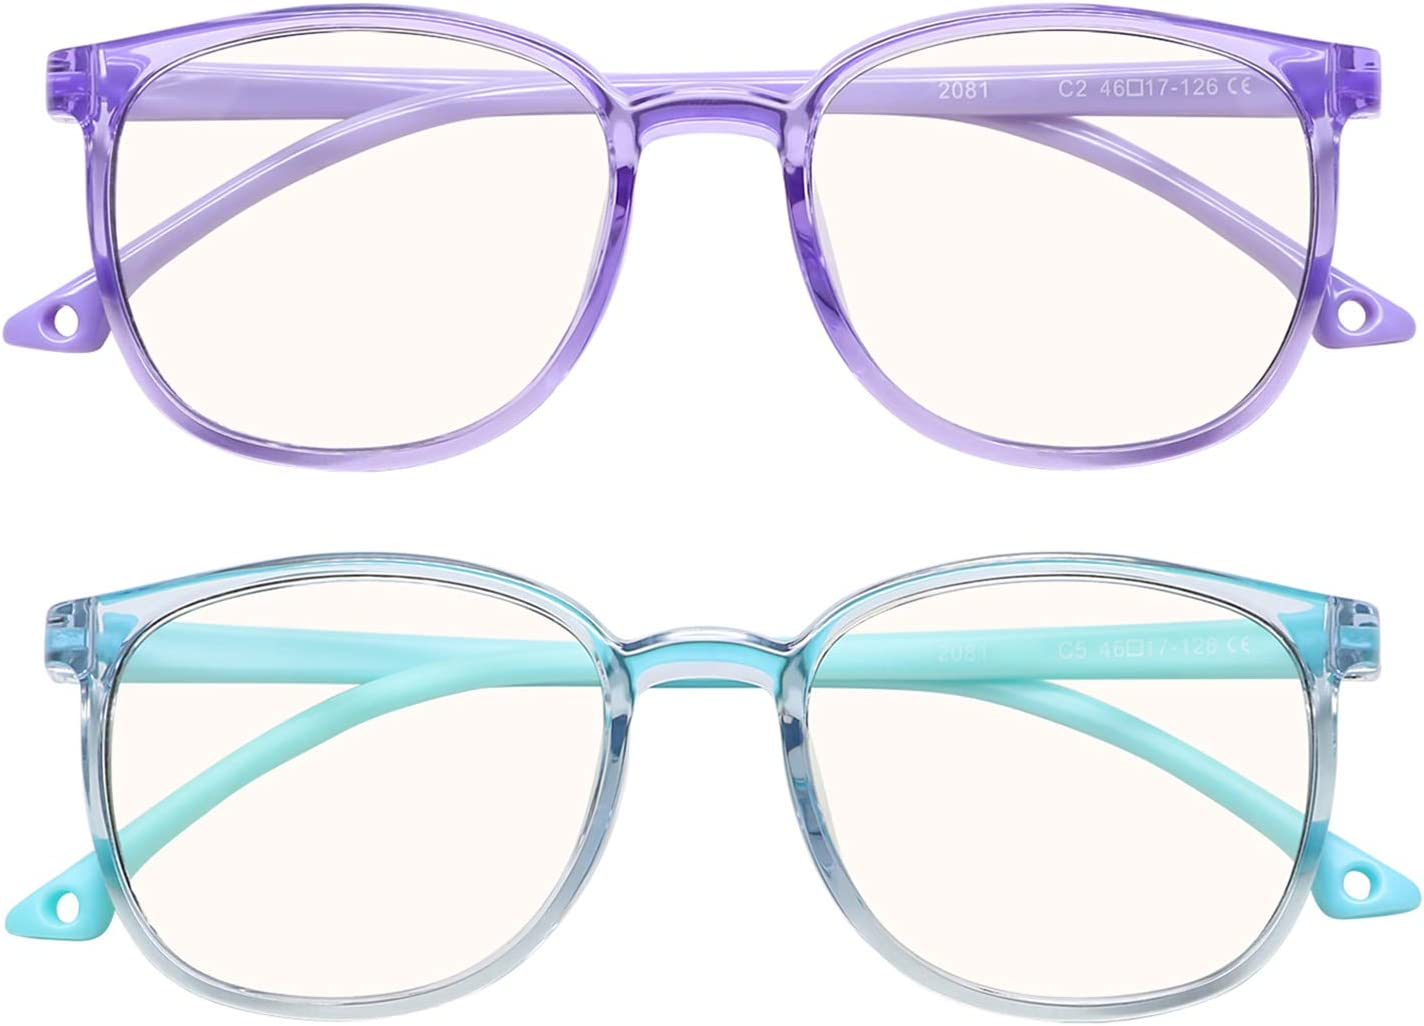 Kingswit Kids Blue Light Blocking Gamin Computer Inexpensive 25% OFF Pack 2 Glasses